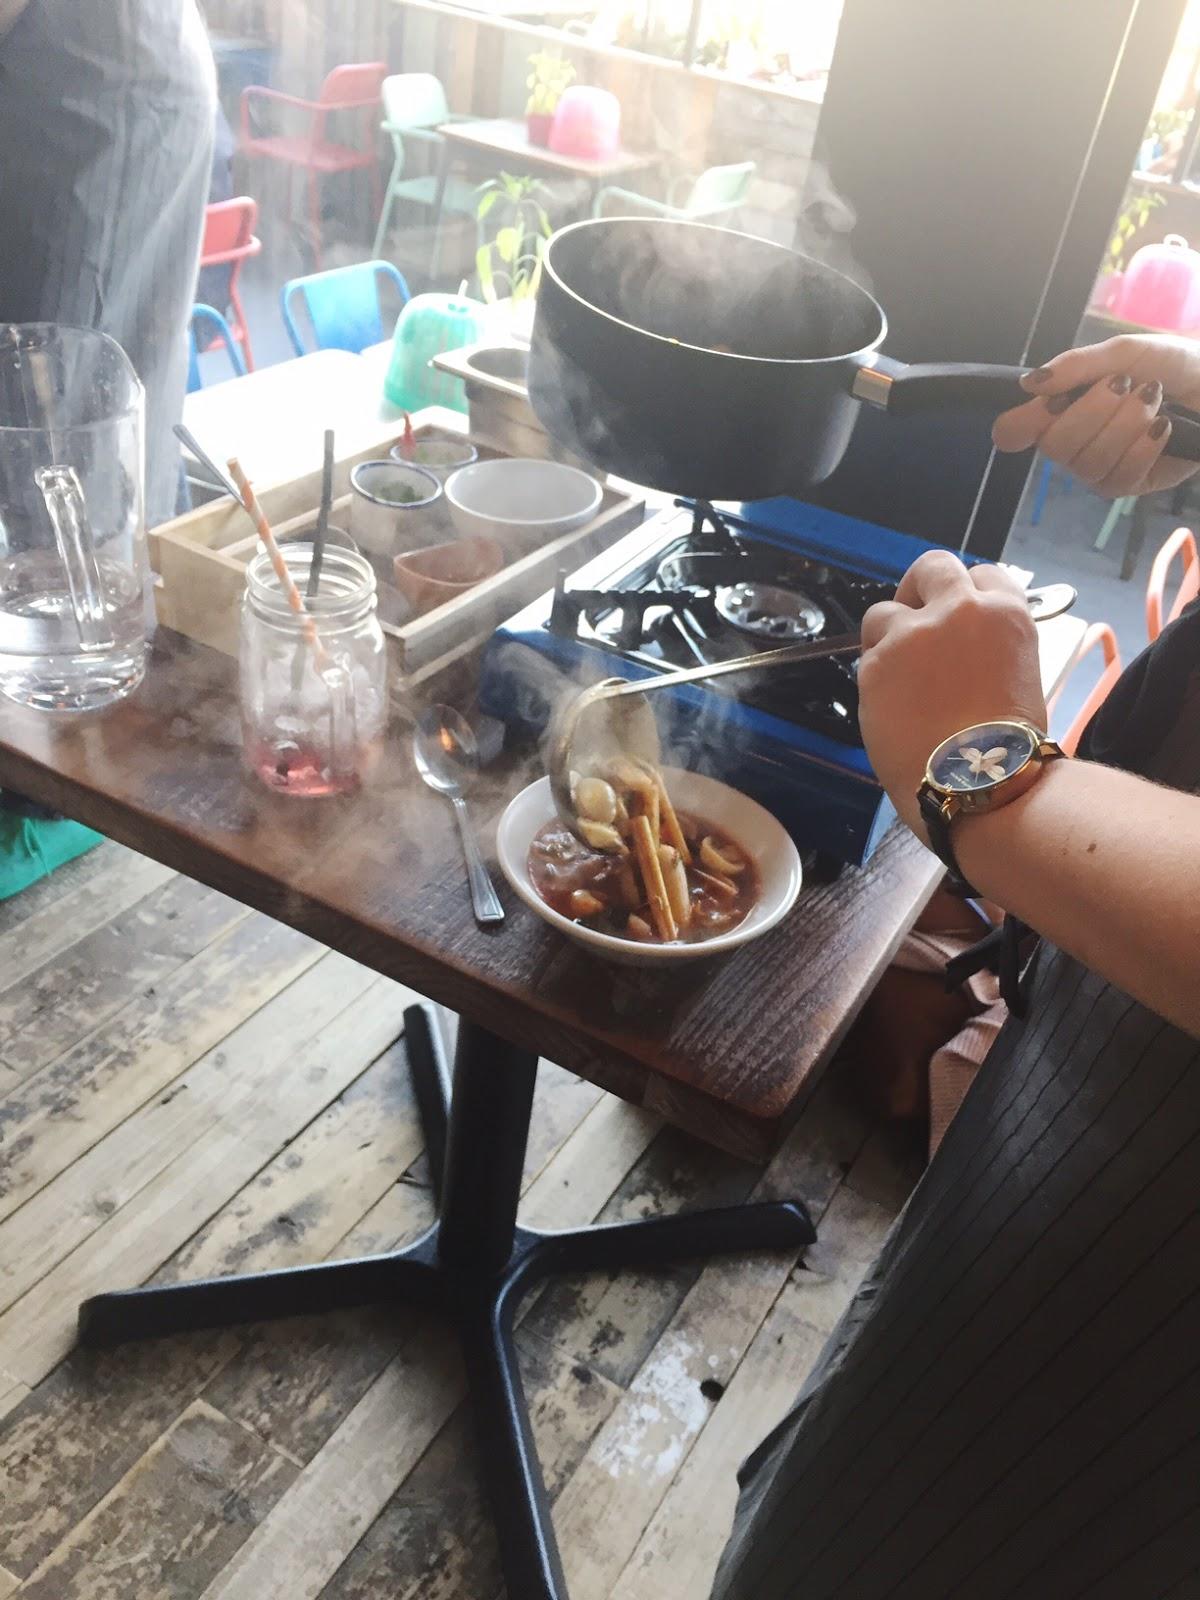 Tom yum soup at Thaikhun southampton